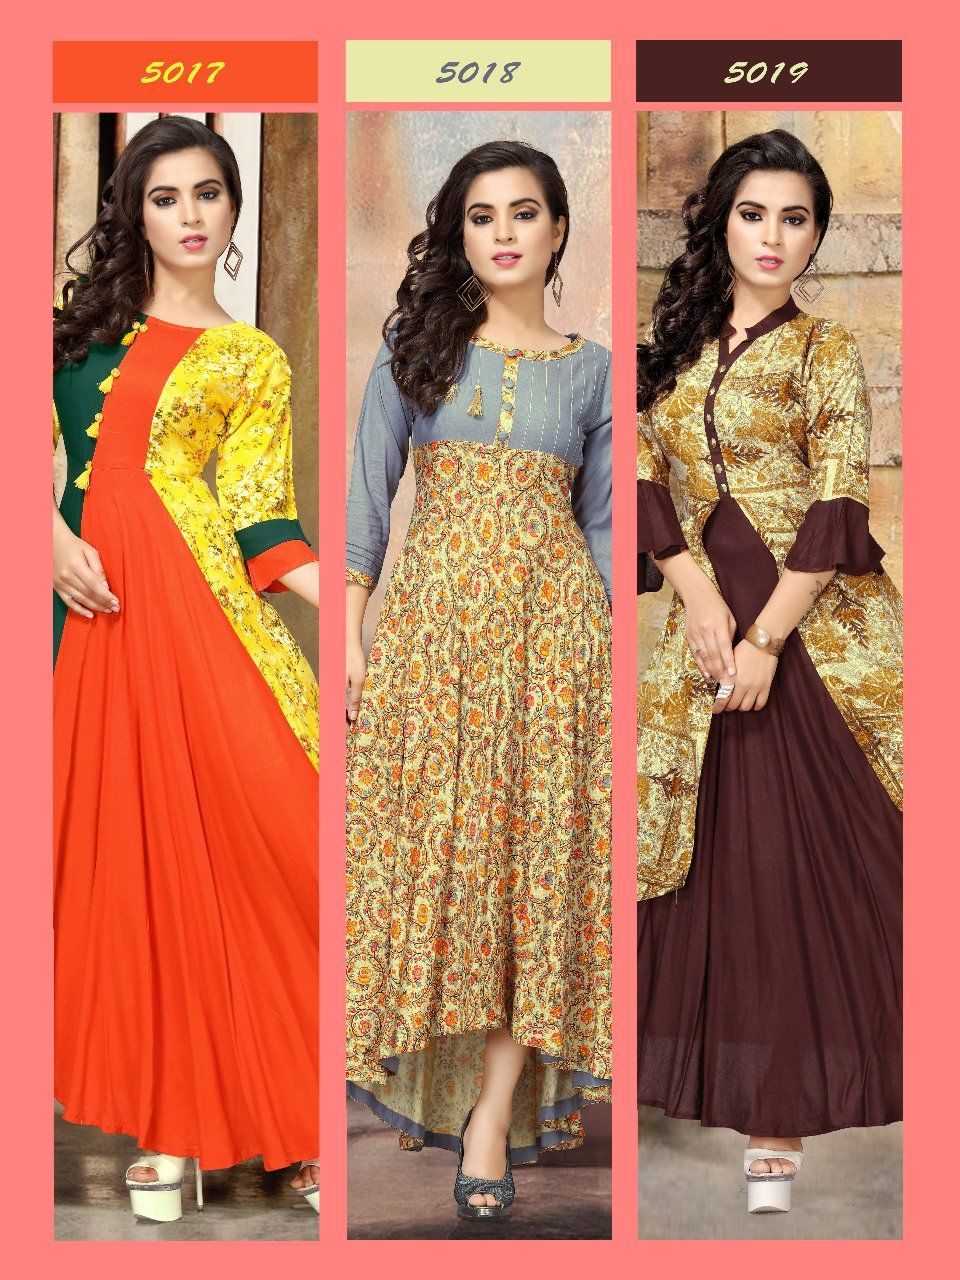 Kalam Details Catalog Name Kalam Vol 2 Designs 10 Pcs Fabrics Detail Top S Wholesale Dress Dress Materials Dresses